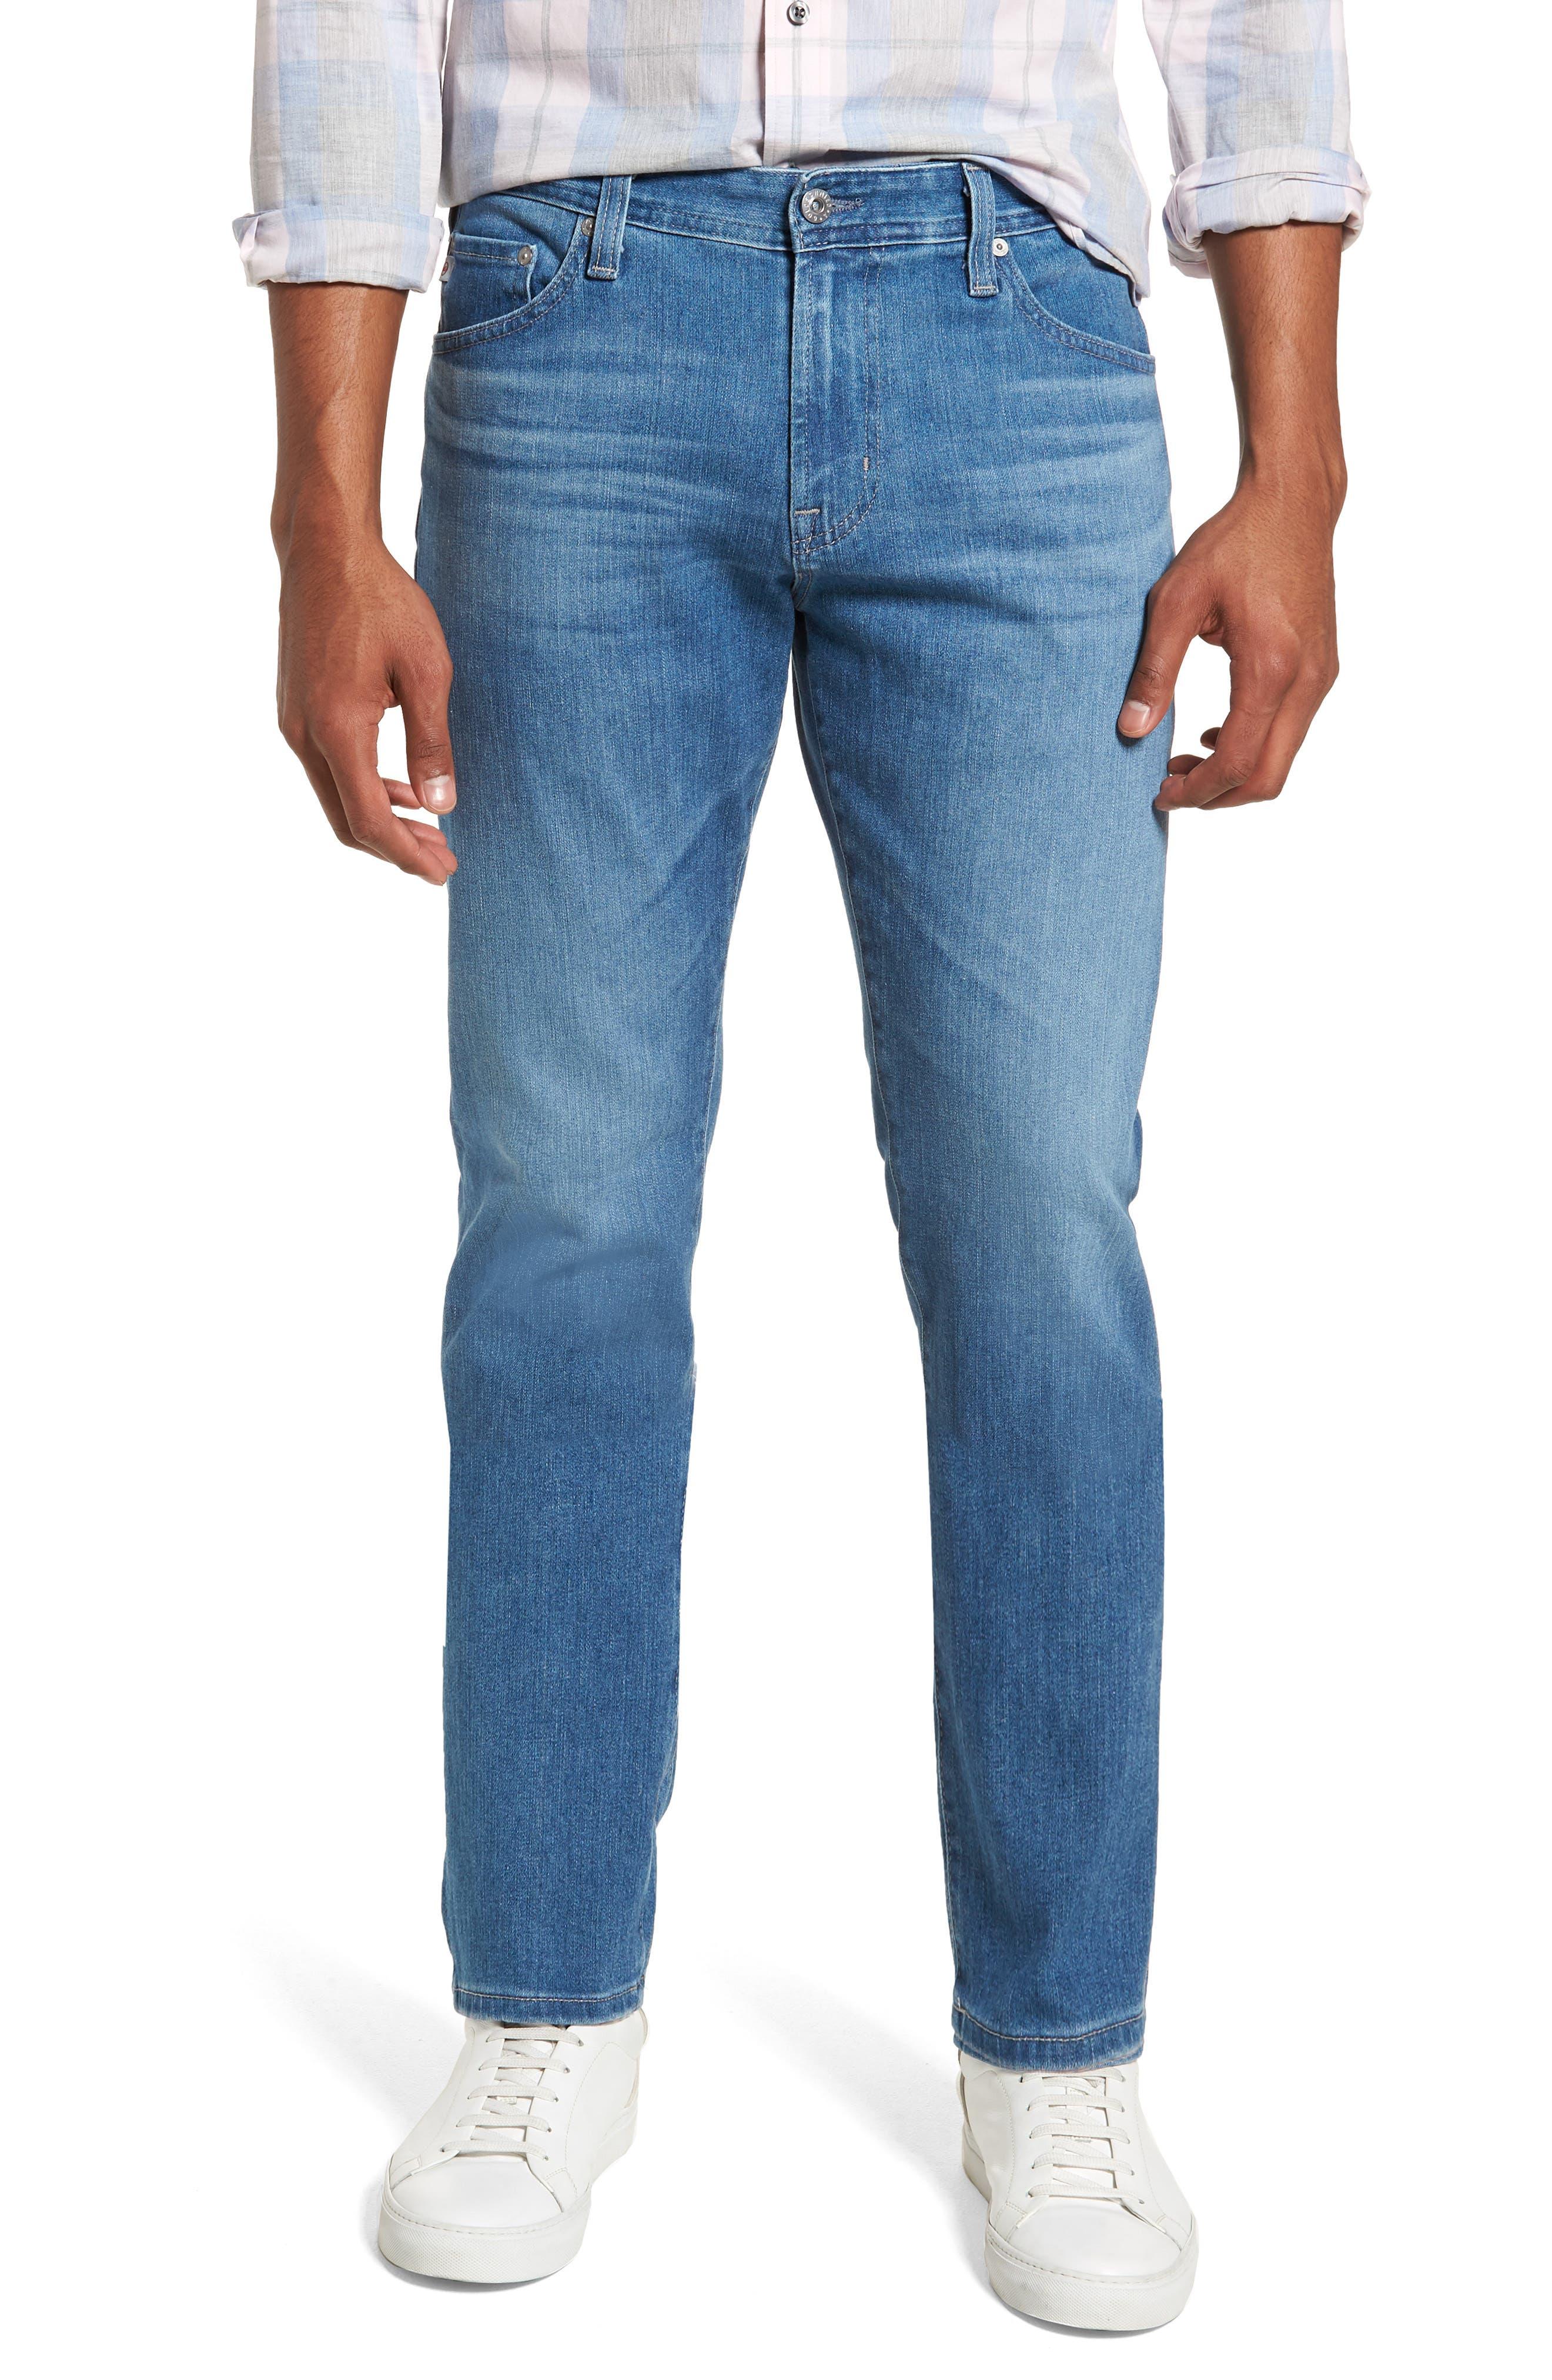 Everett Slim Straight Leg Jeans,                         Main,                         color, SEA WAVE